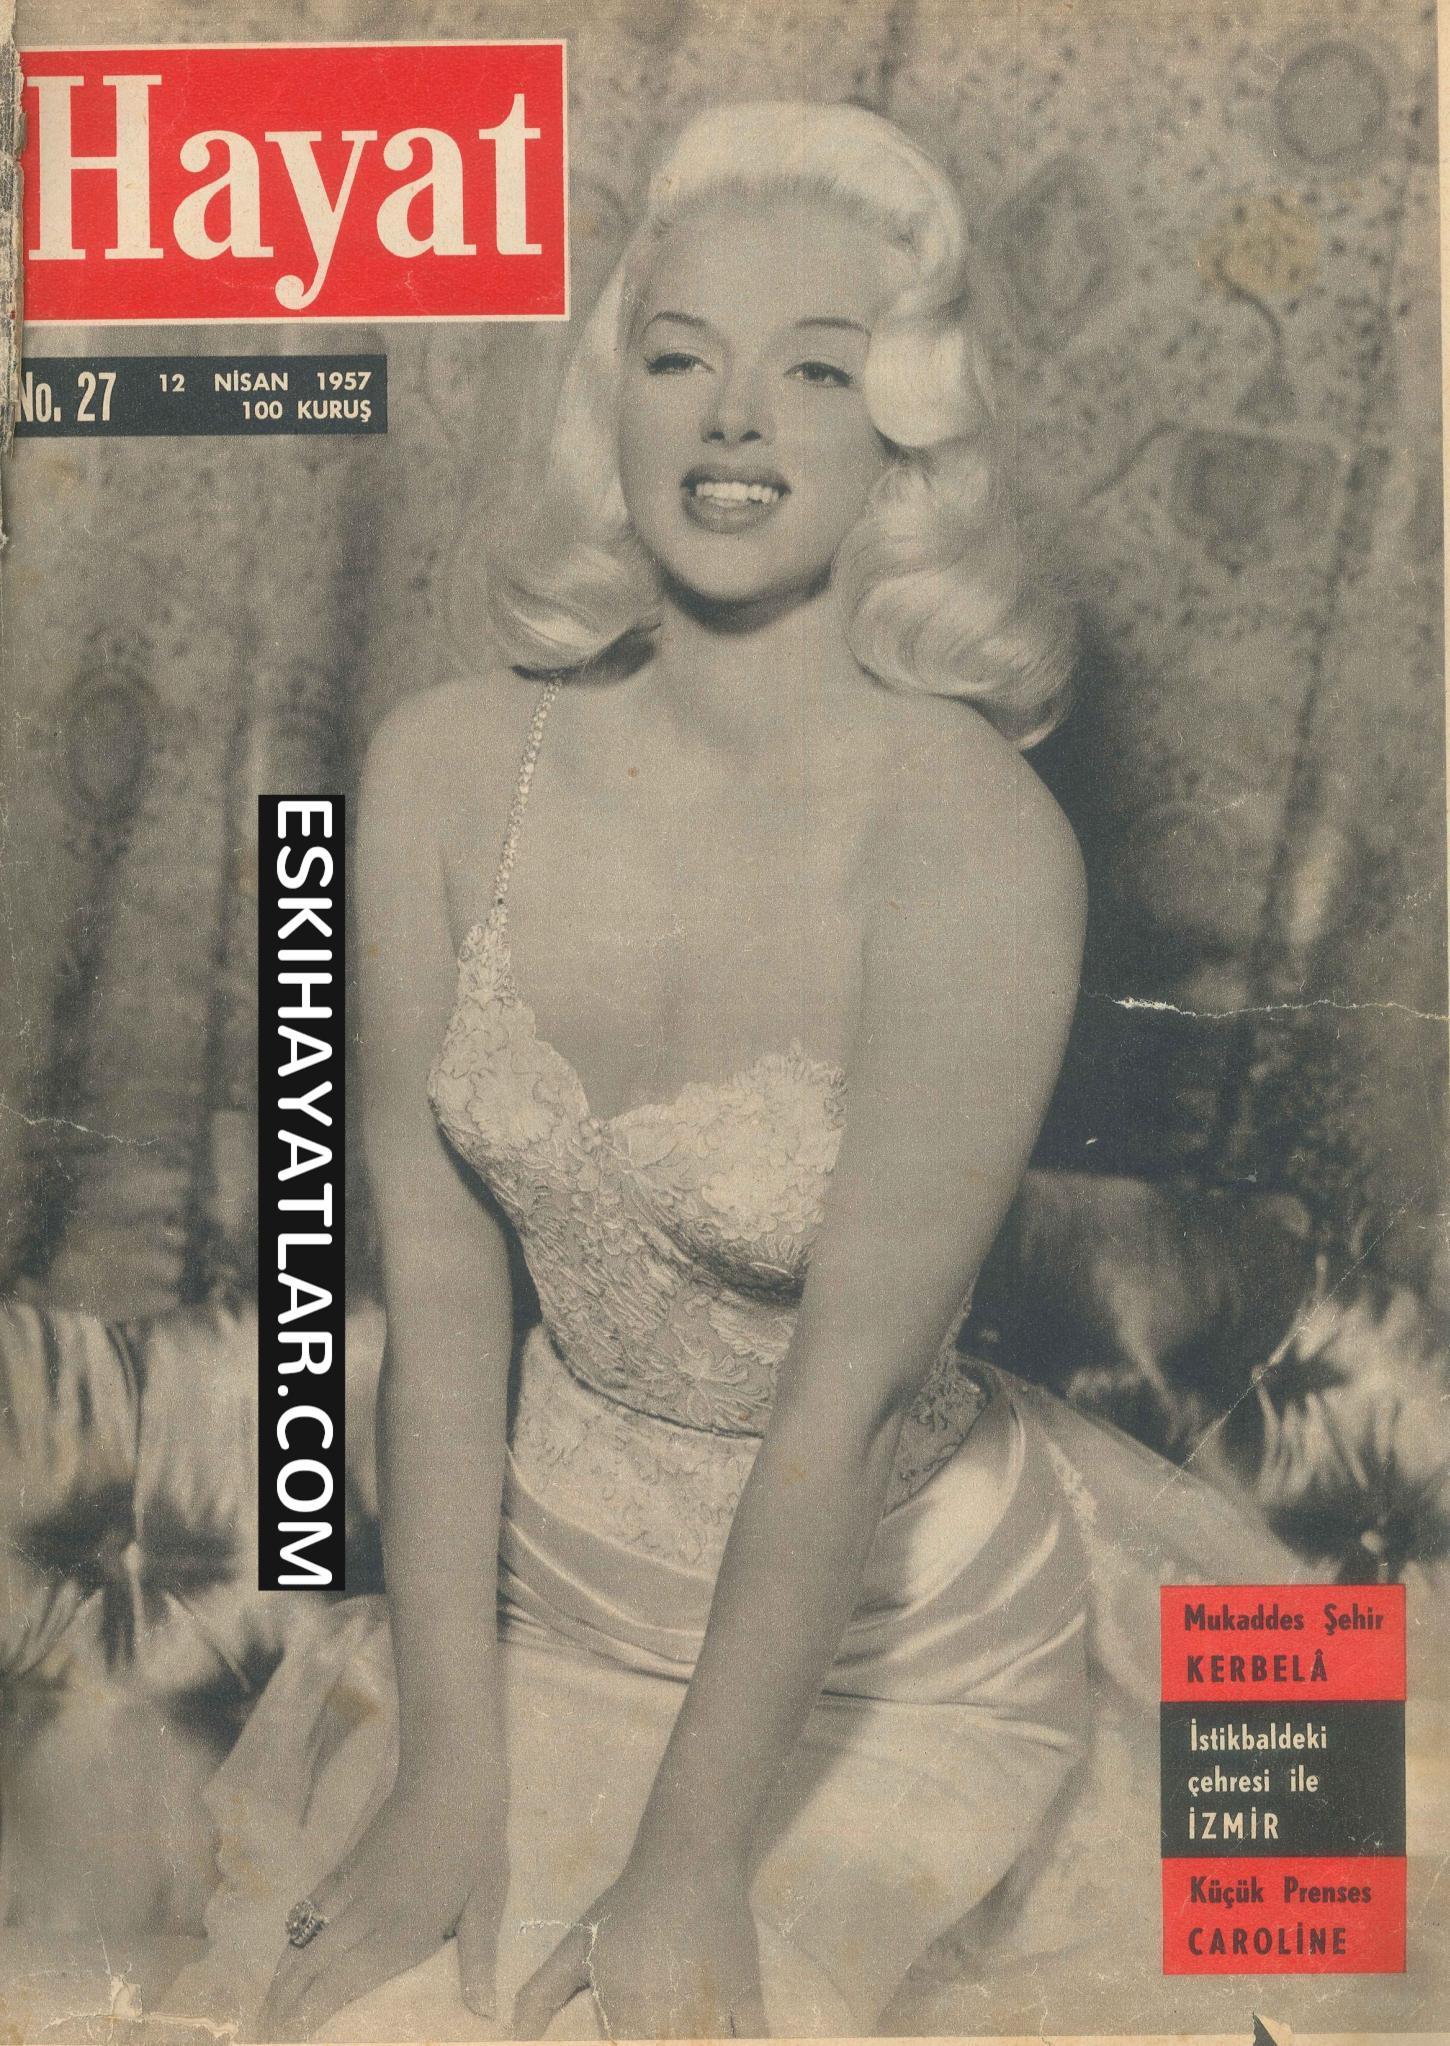 adnan-menderes-doneminde-sehir-planlamalari-izmir-krokileri-hayat-dergisi-1957 (1)